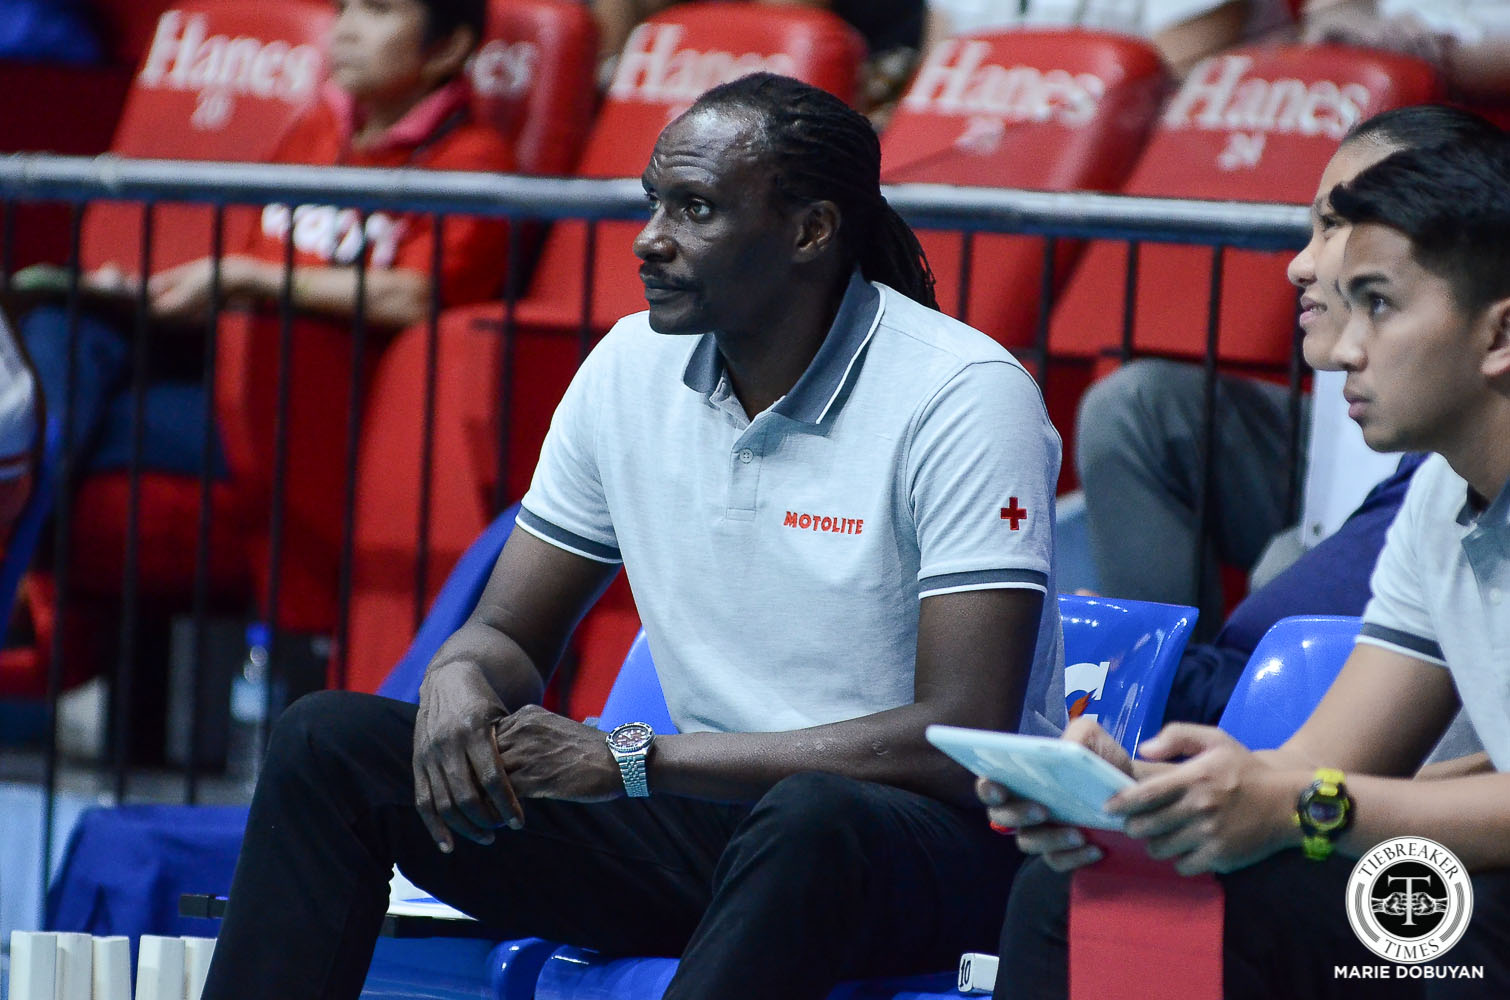 Tiebreaker Times Godfrey Okumu airs frustration on Motolite-Choco Mucho officiating: 'How bad can they be?' News PVL Volleyball  Motolite Godfrey Okumu 2019 PVL Season 2019 PVL Open Conference